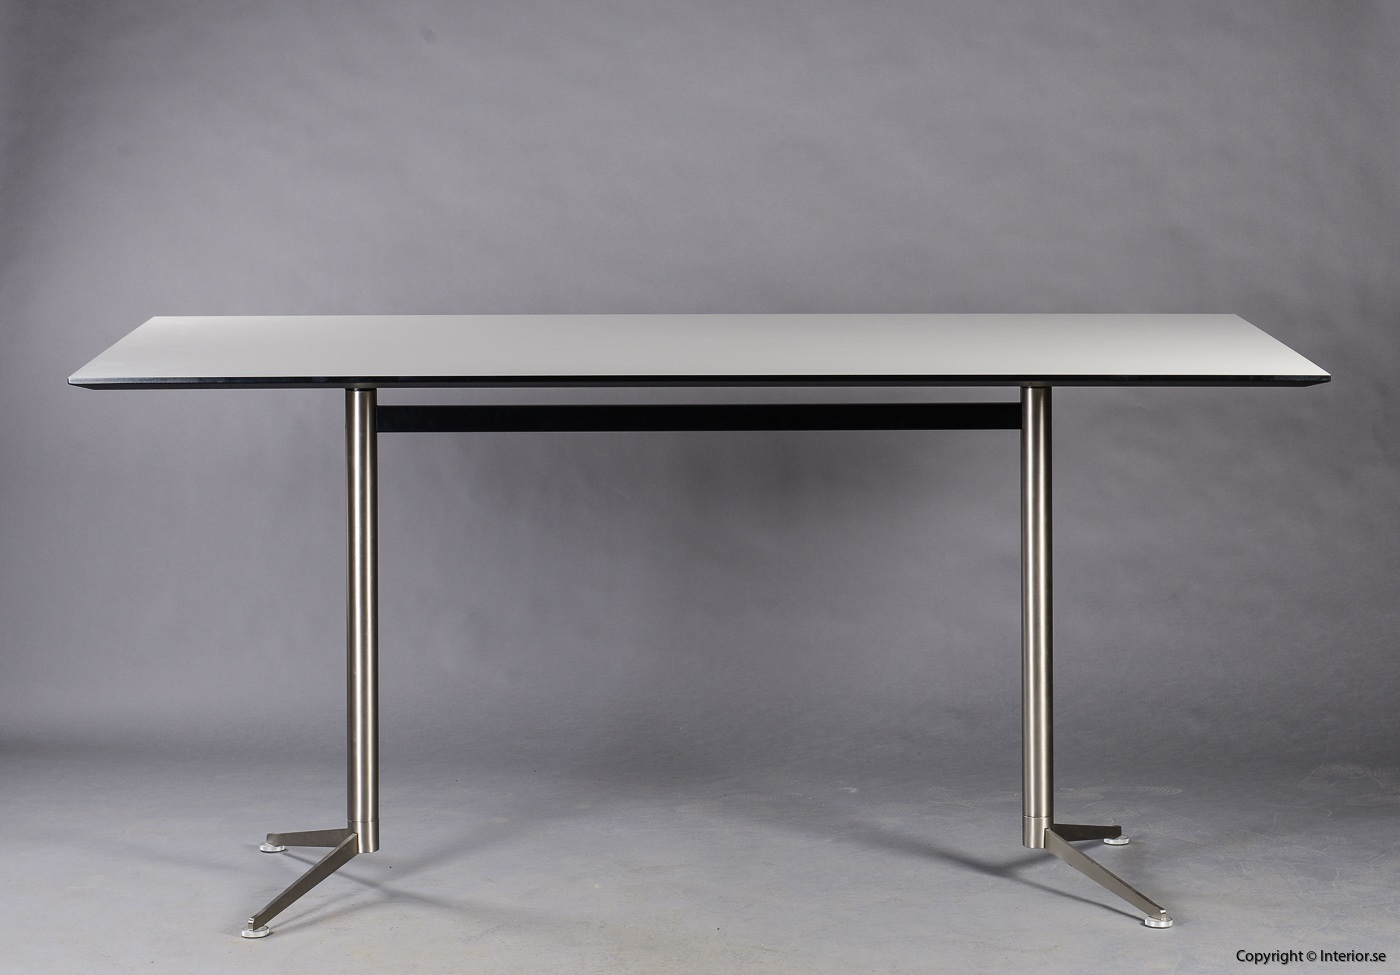 1 Bord Pausitan Spinal Table Paul Leroy begagnade kontorsmöbler designmöbler (4)